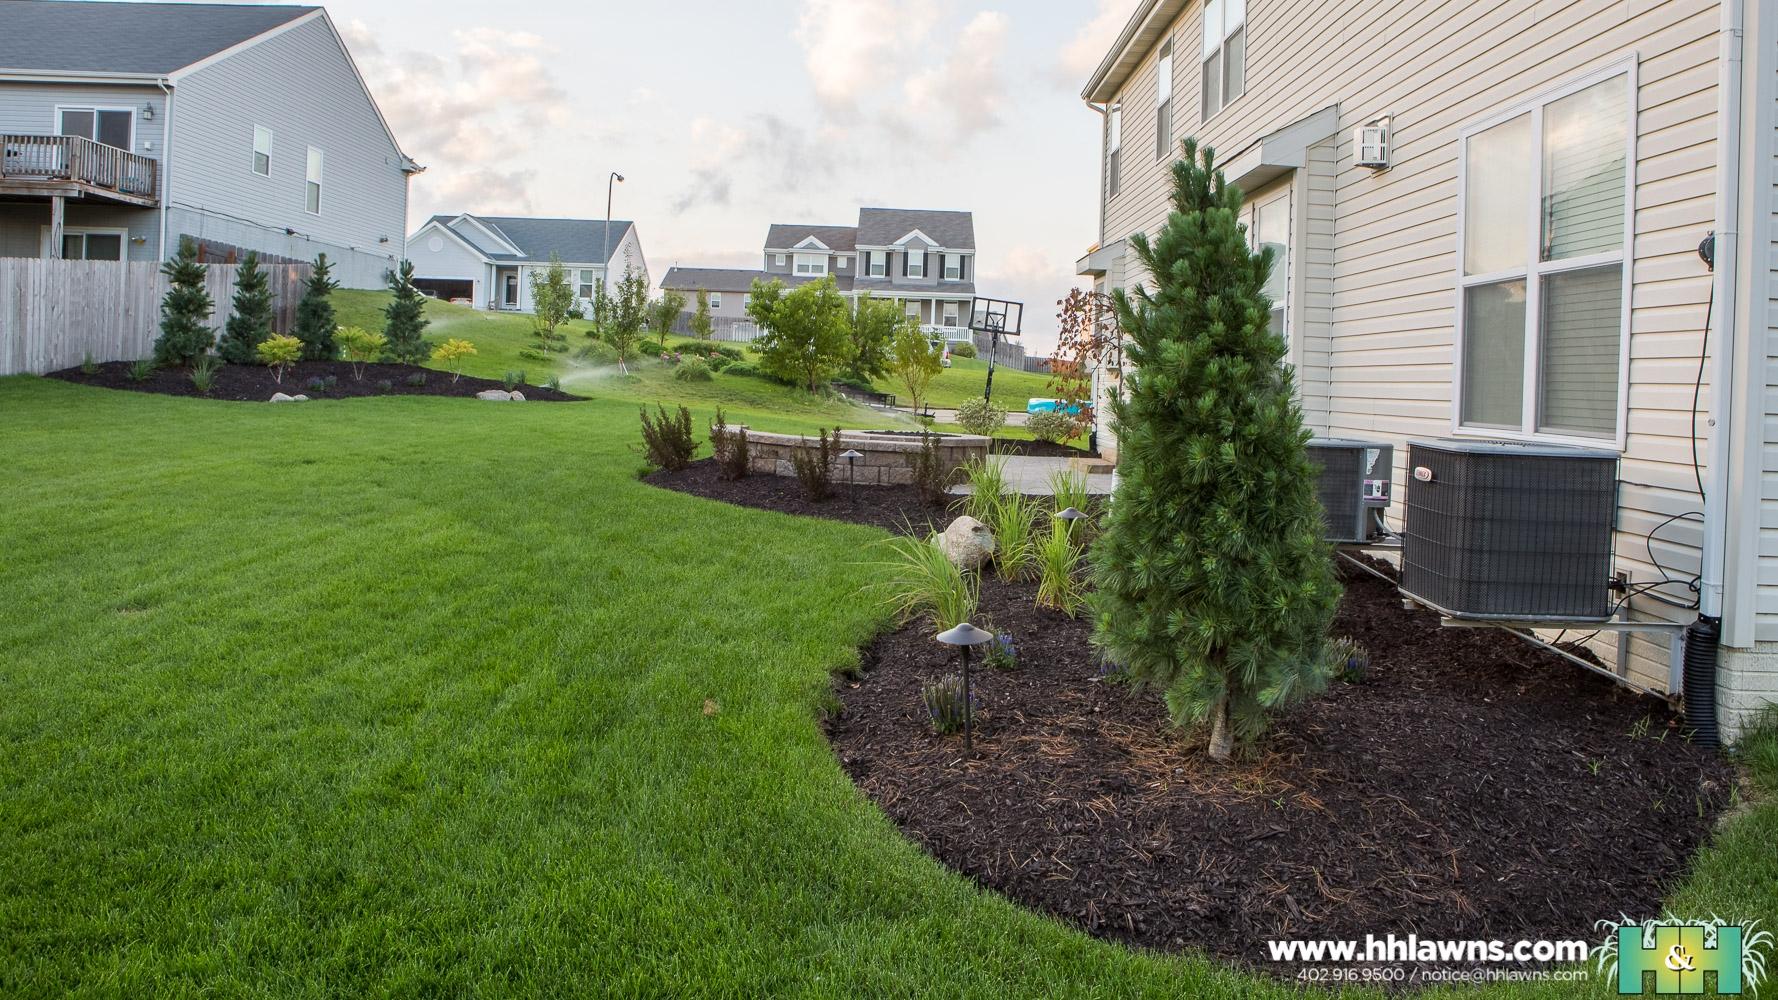 Barry Webber Outdoor Patio Landscape Project 2016 (H&H Lawn and Landscape)